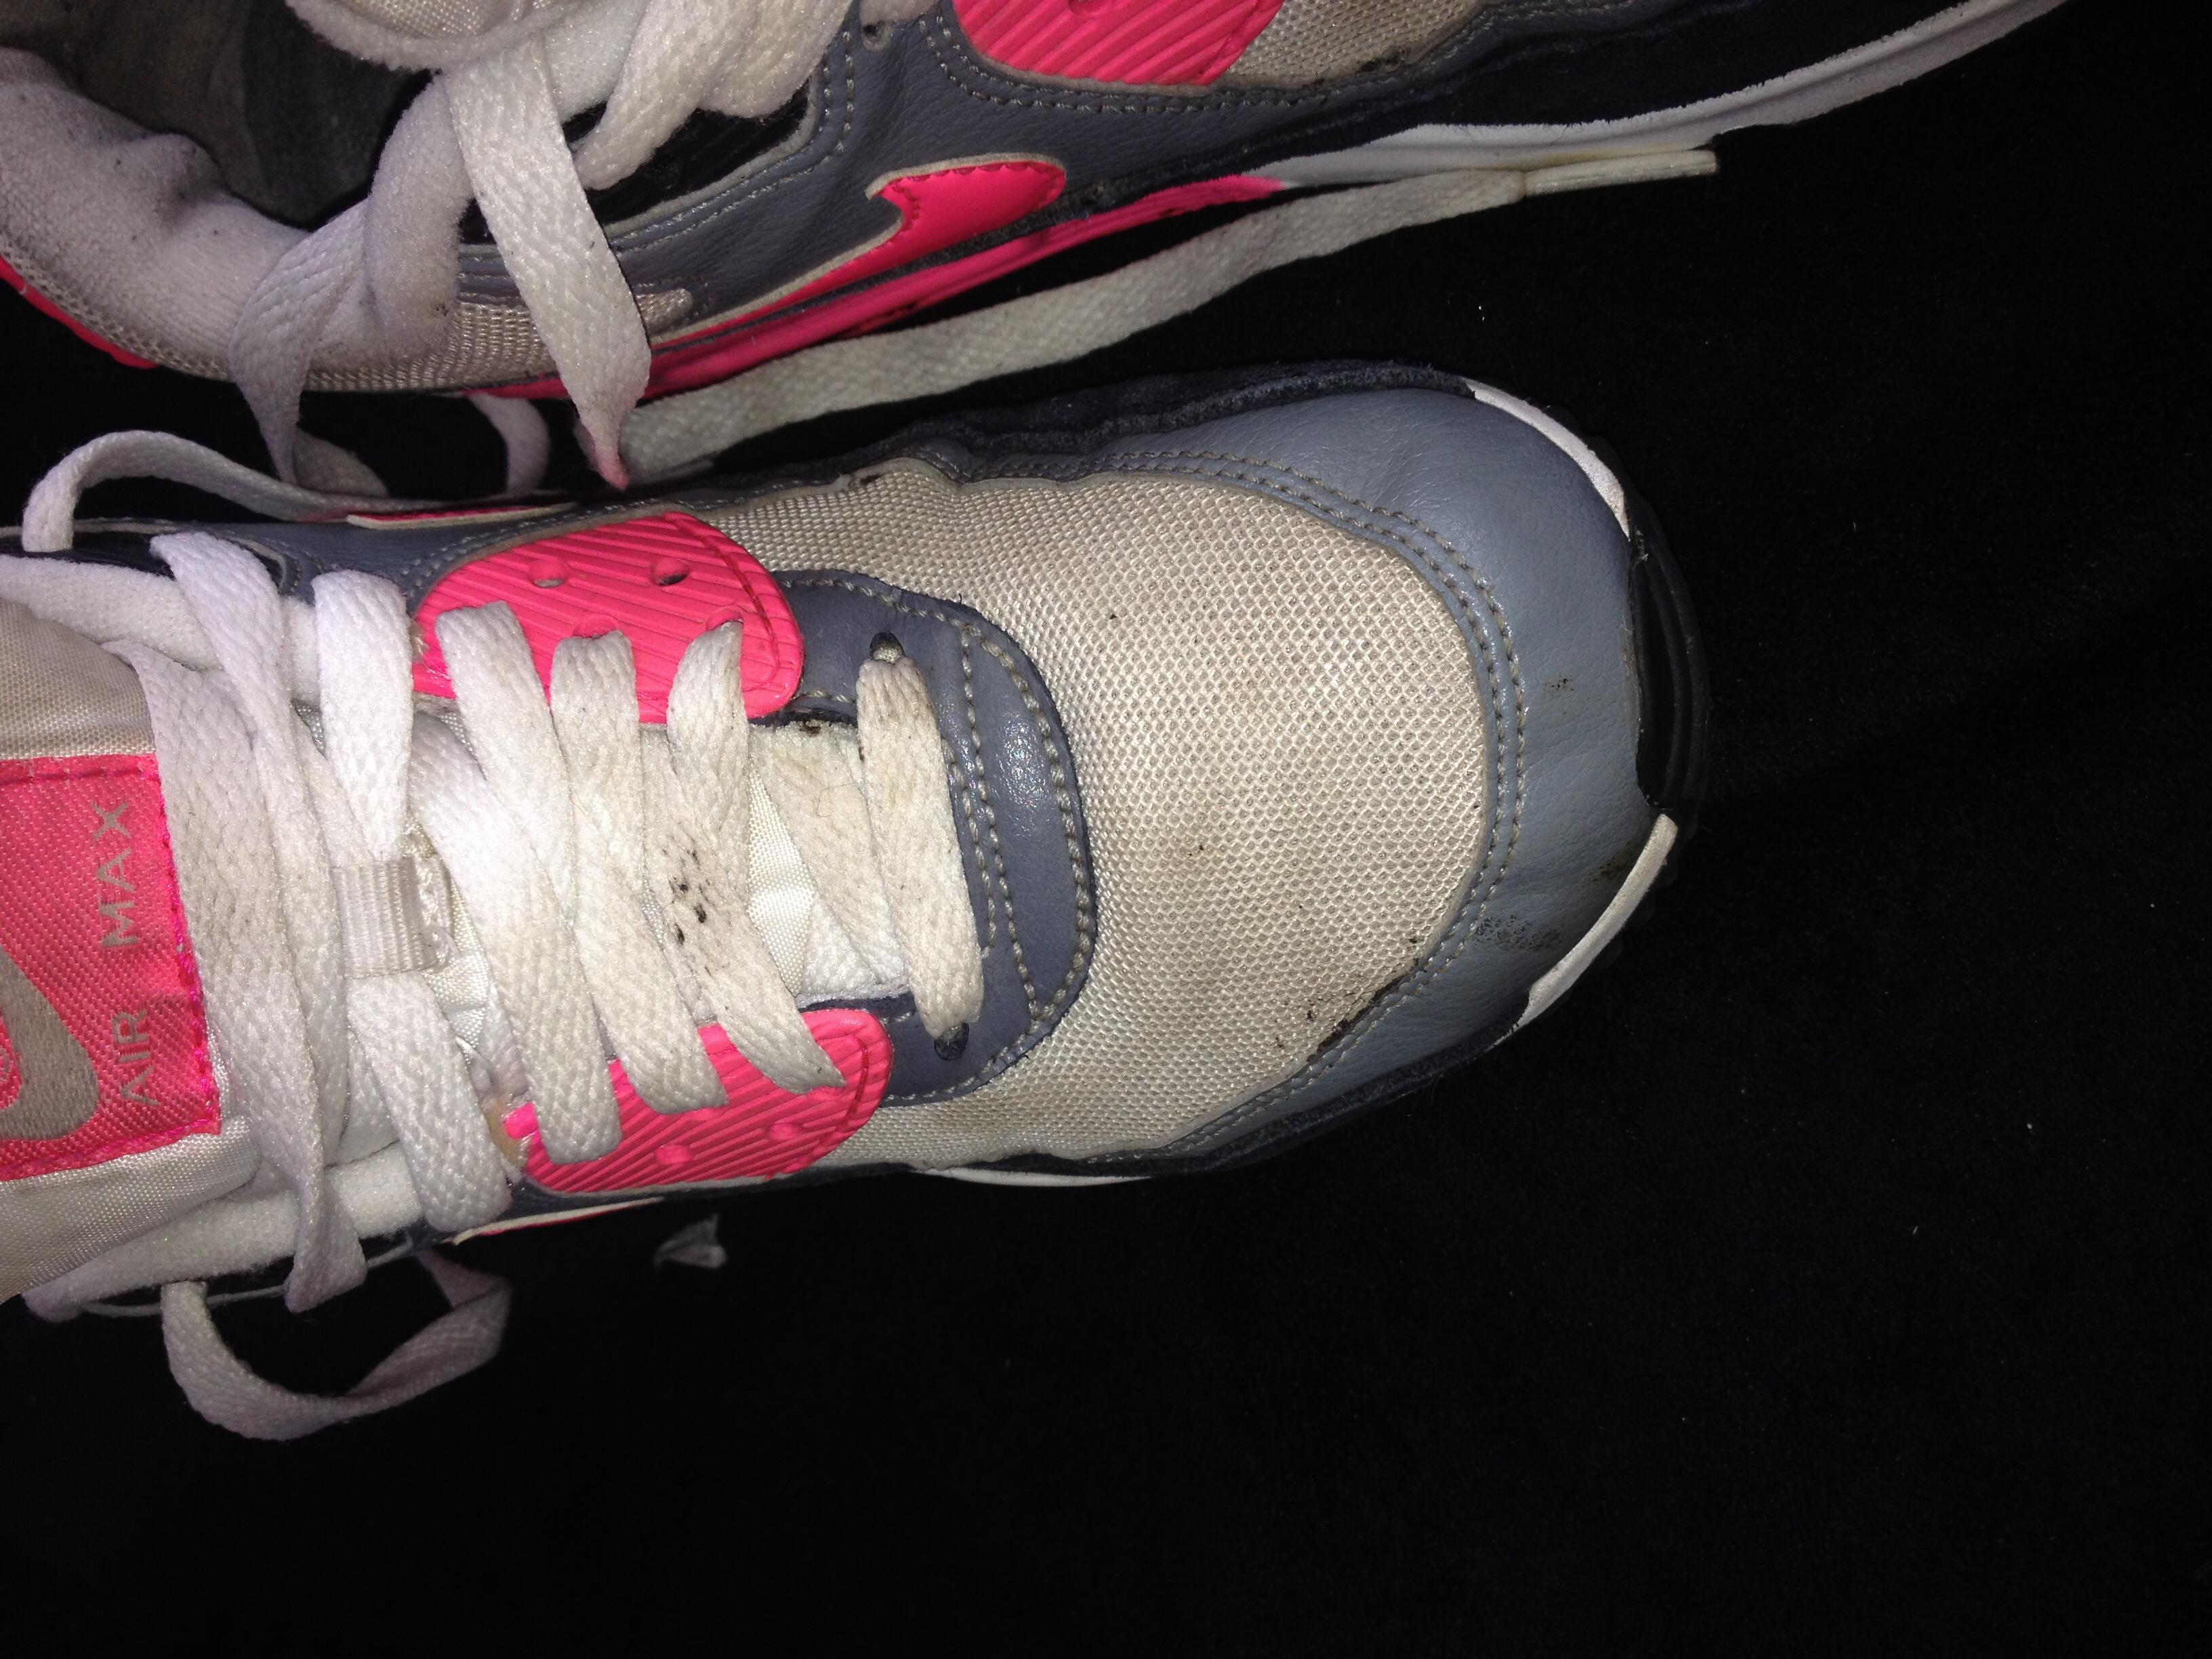 100% authentic 34ecf 446de Waschen Max Qxtwgxxt 5nR6qwxABC Schuhe Man Nike Kann Air g48IAqwg.